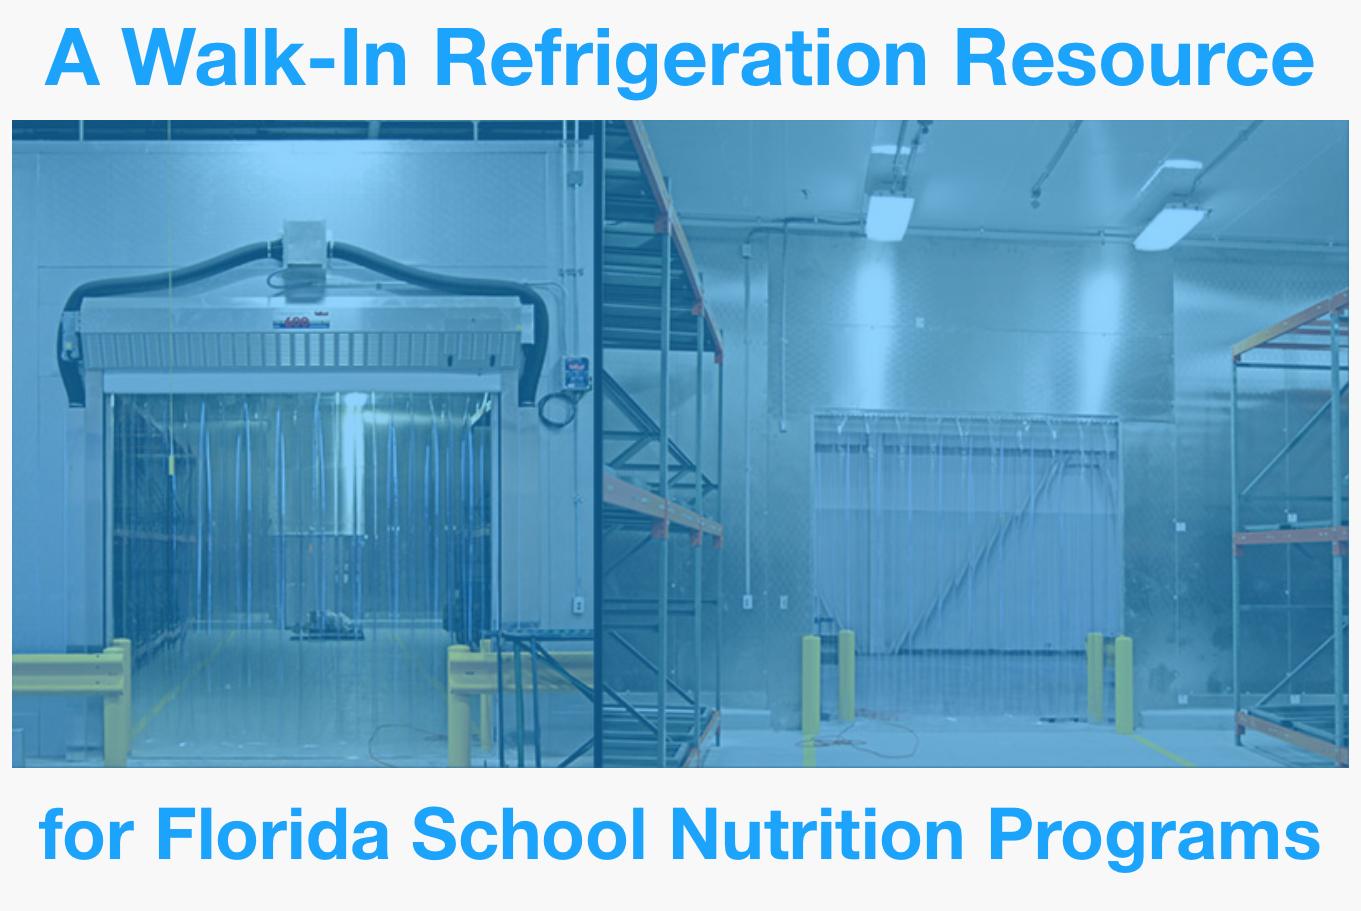 A Walk-In Refrigeration Resource for Florida School Nutrition Programs